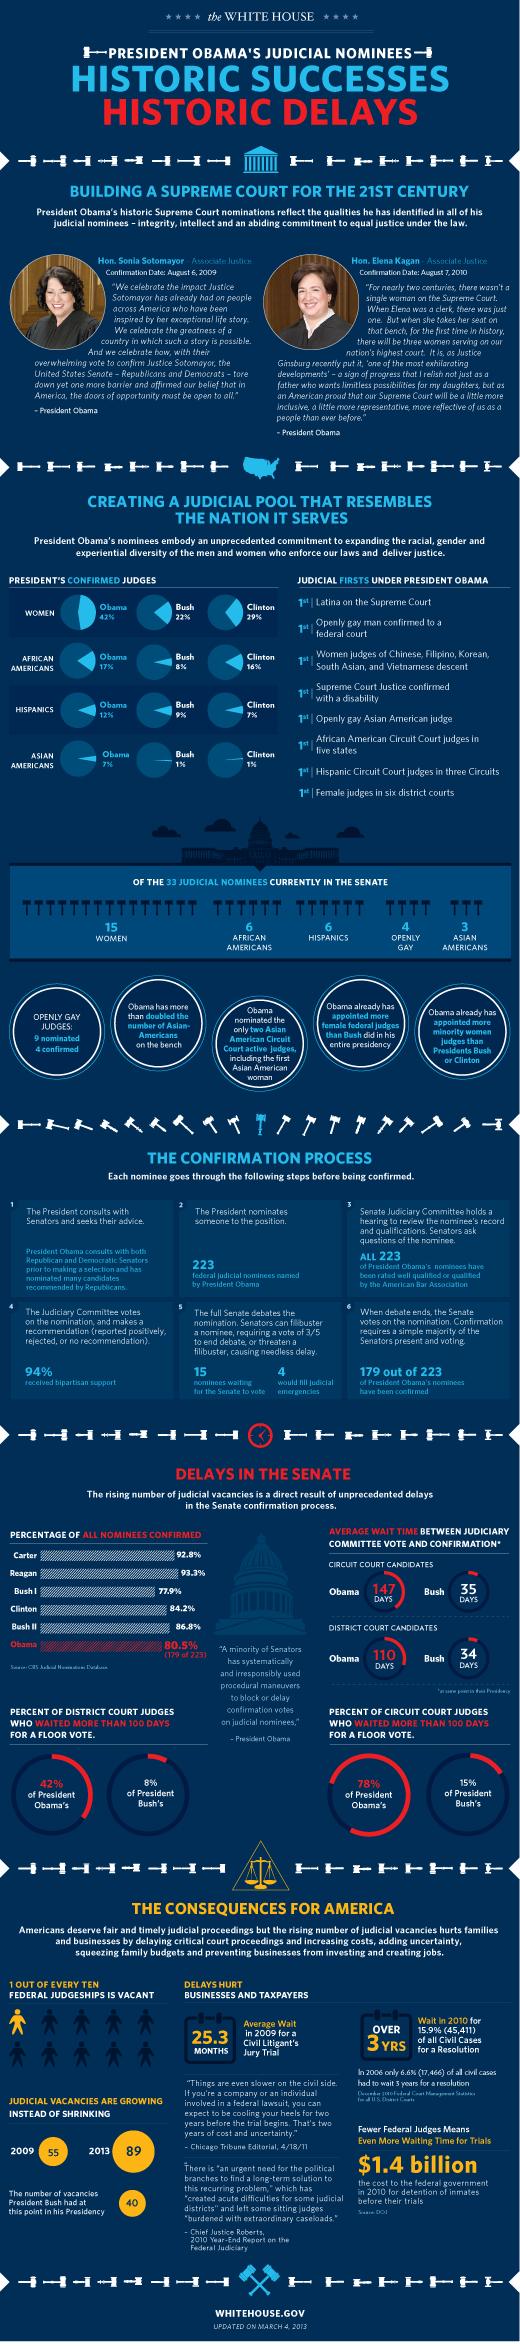 wh_judicial_2013_infographic_blog